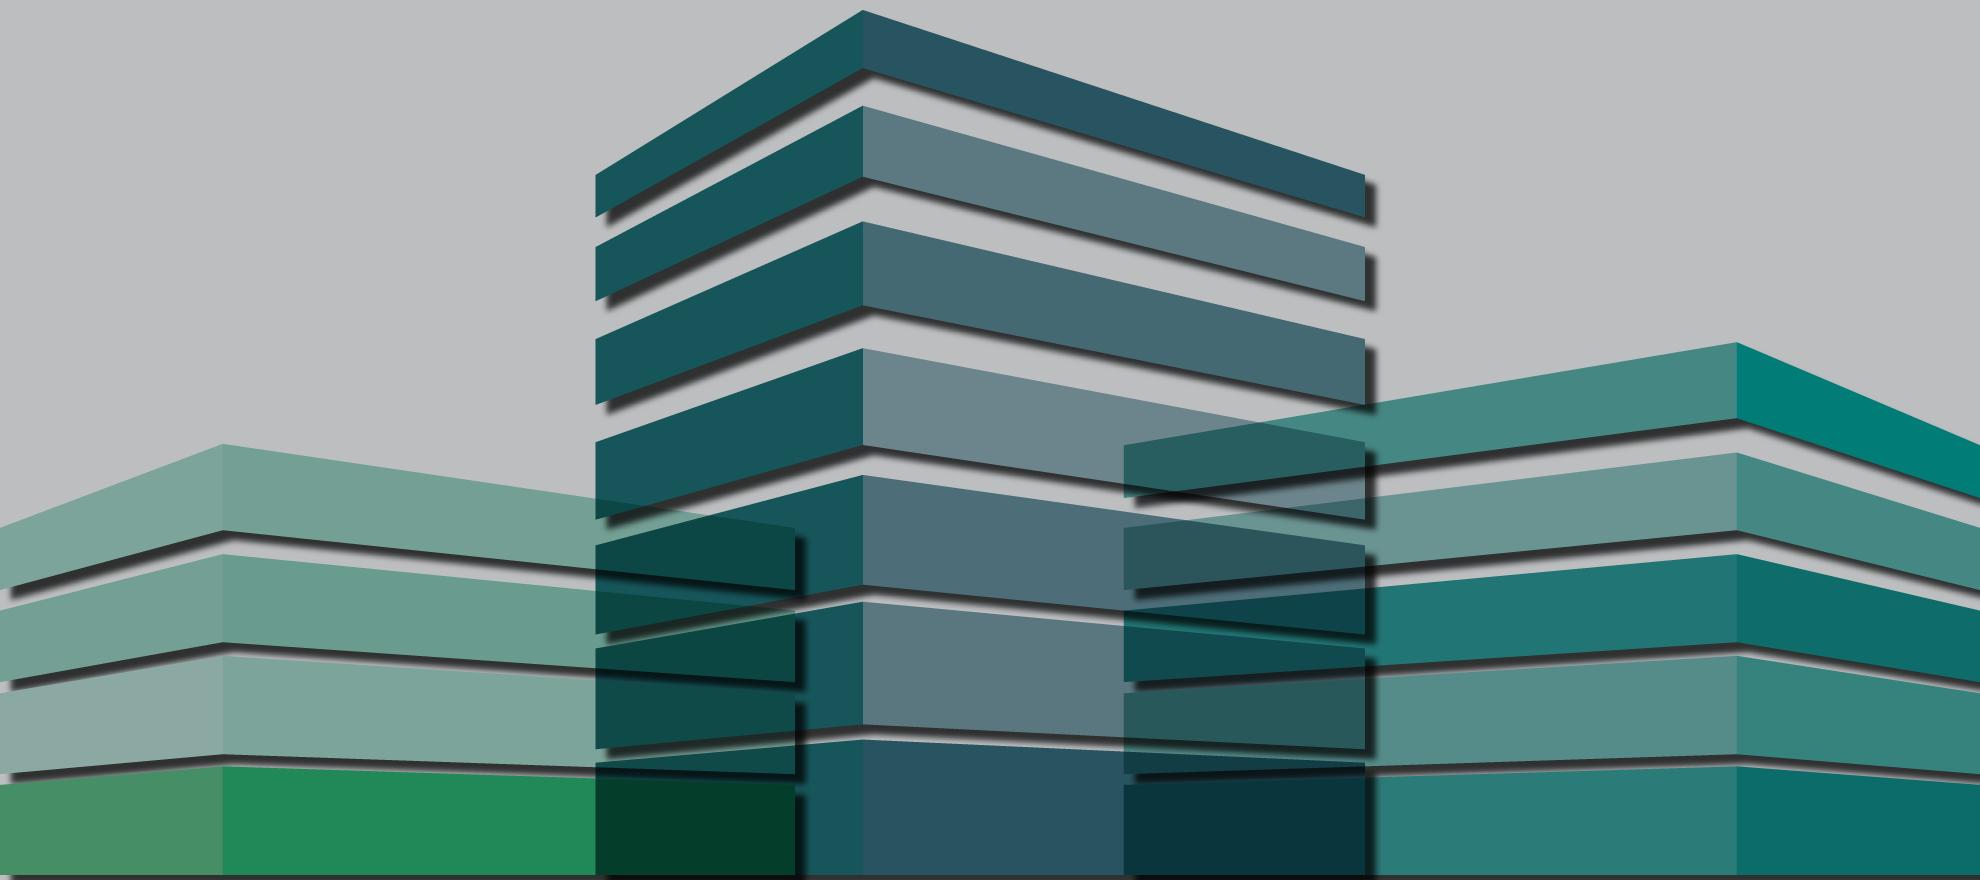 Intellis Moving The Built Environment Forward